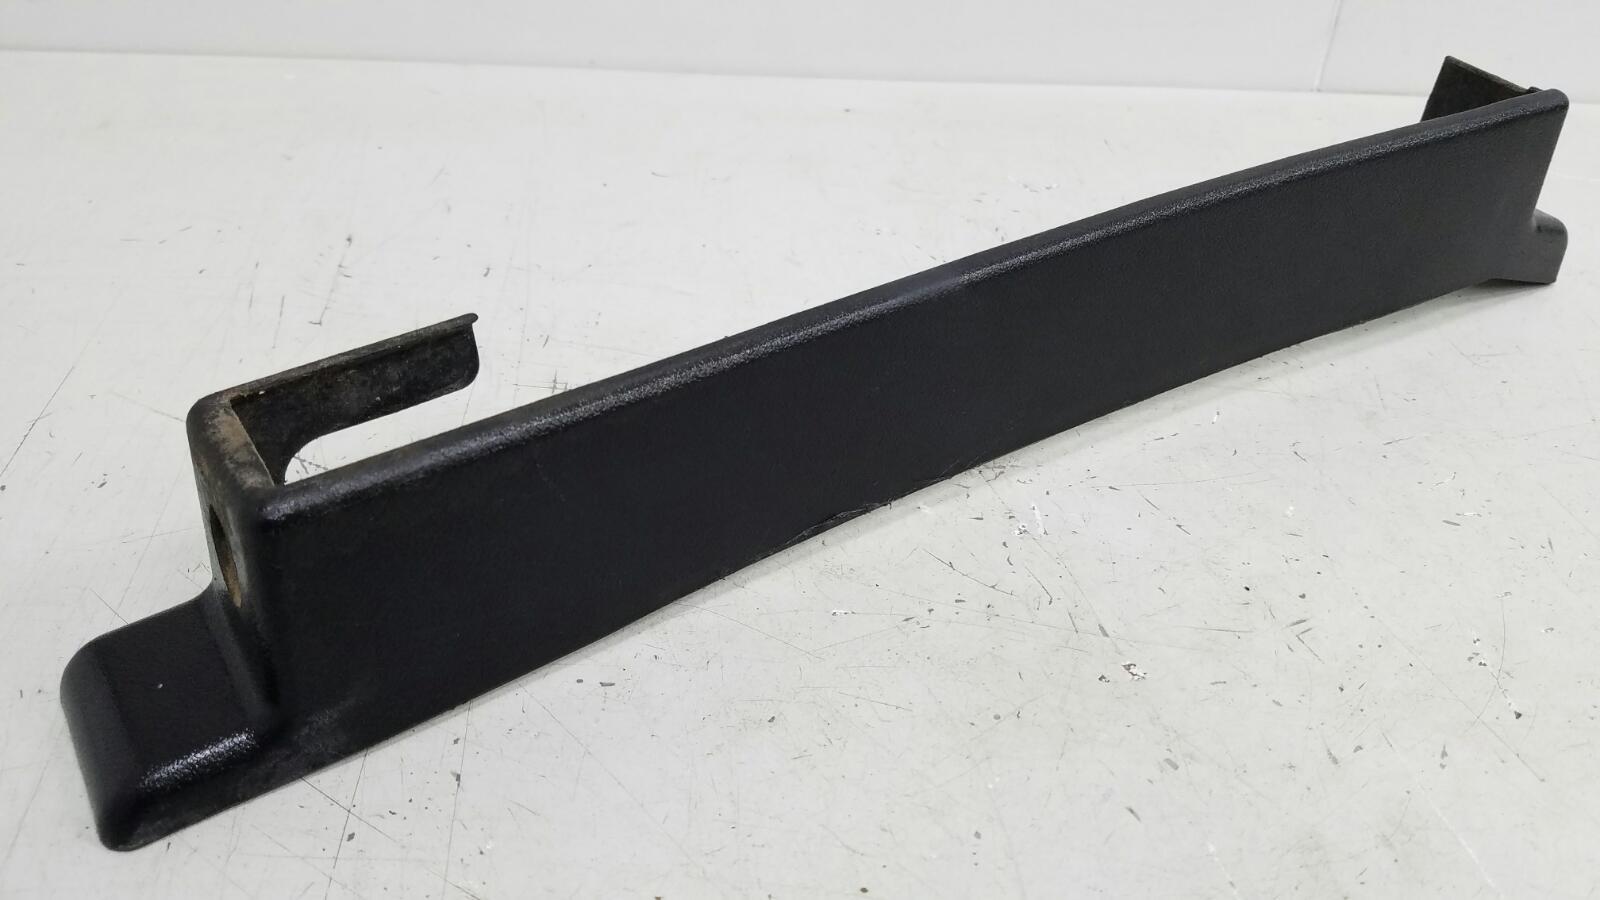 Накладка салазок сиденья Lifan Solano 620 LF481Q3 2011